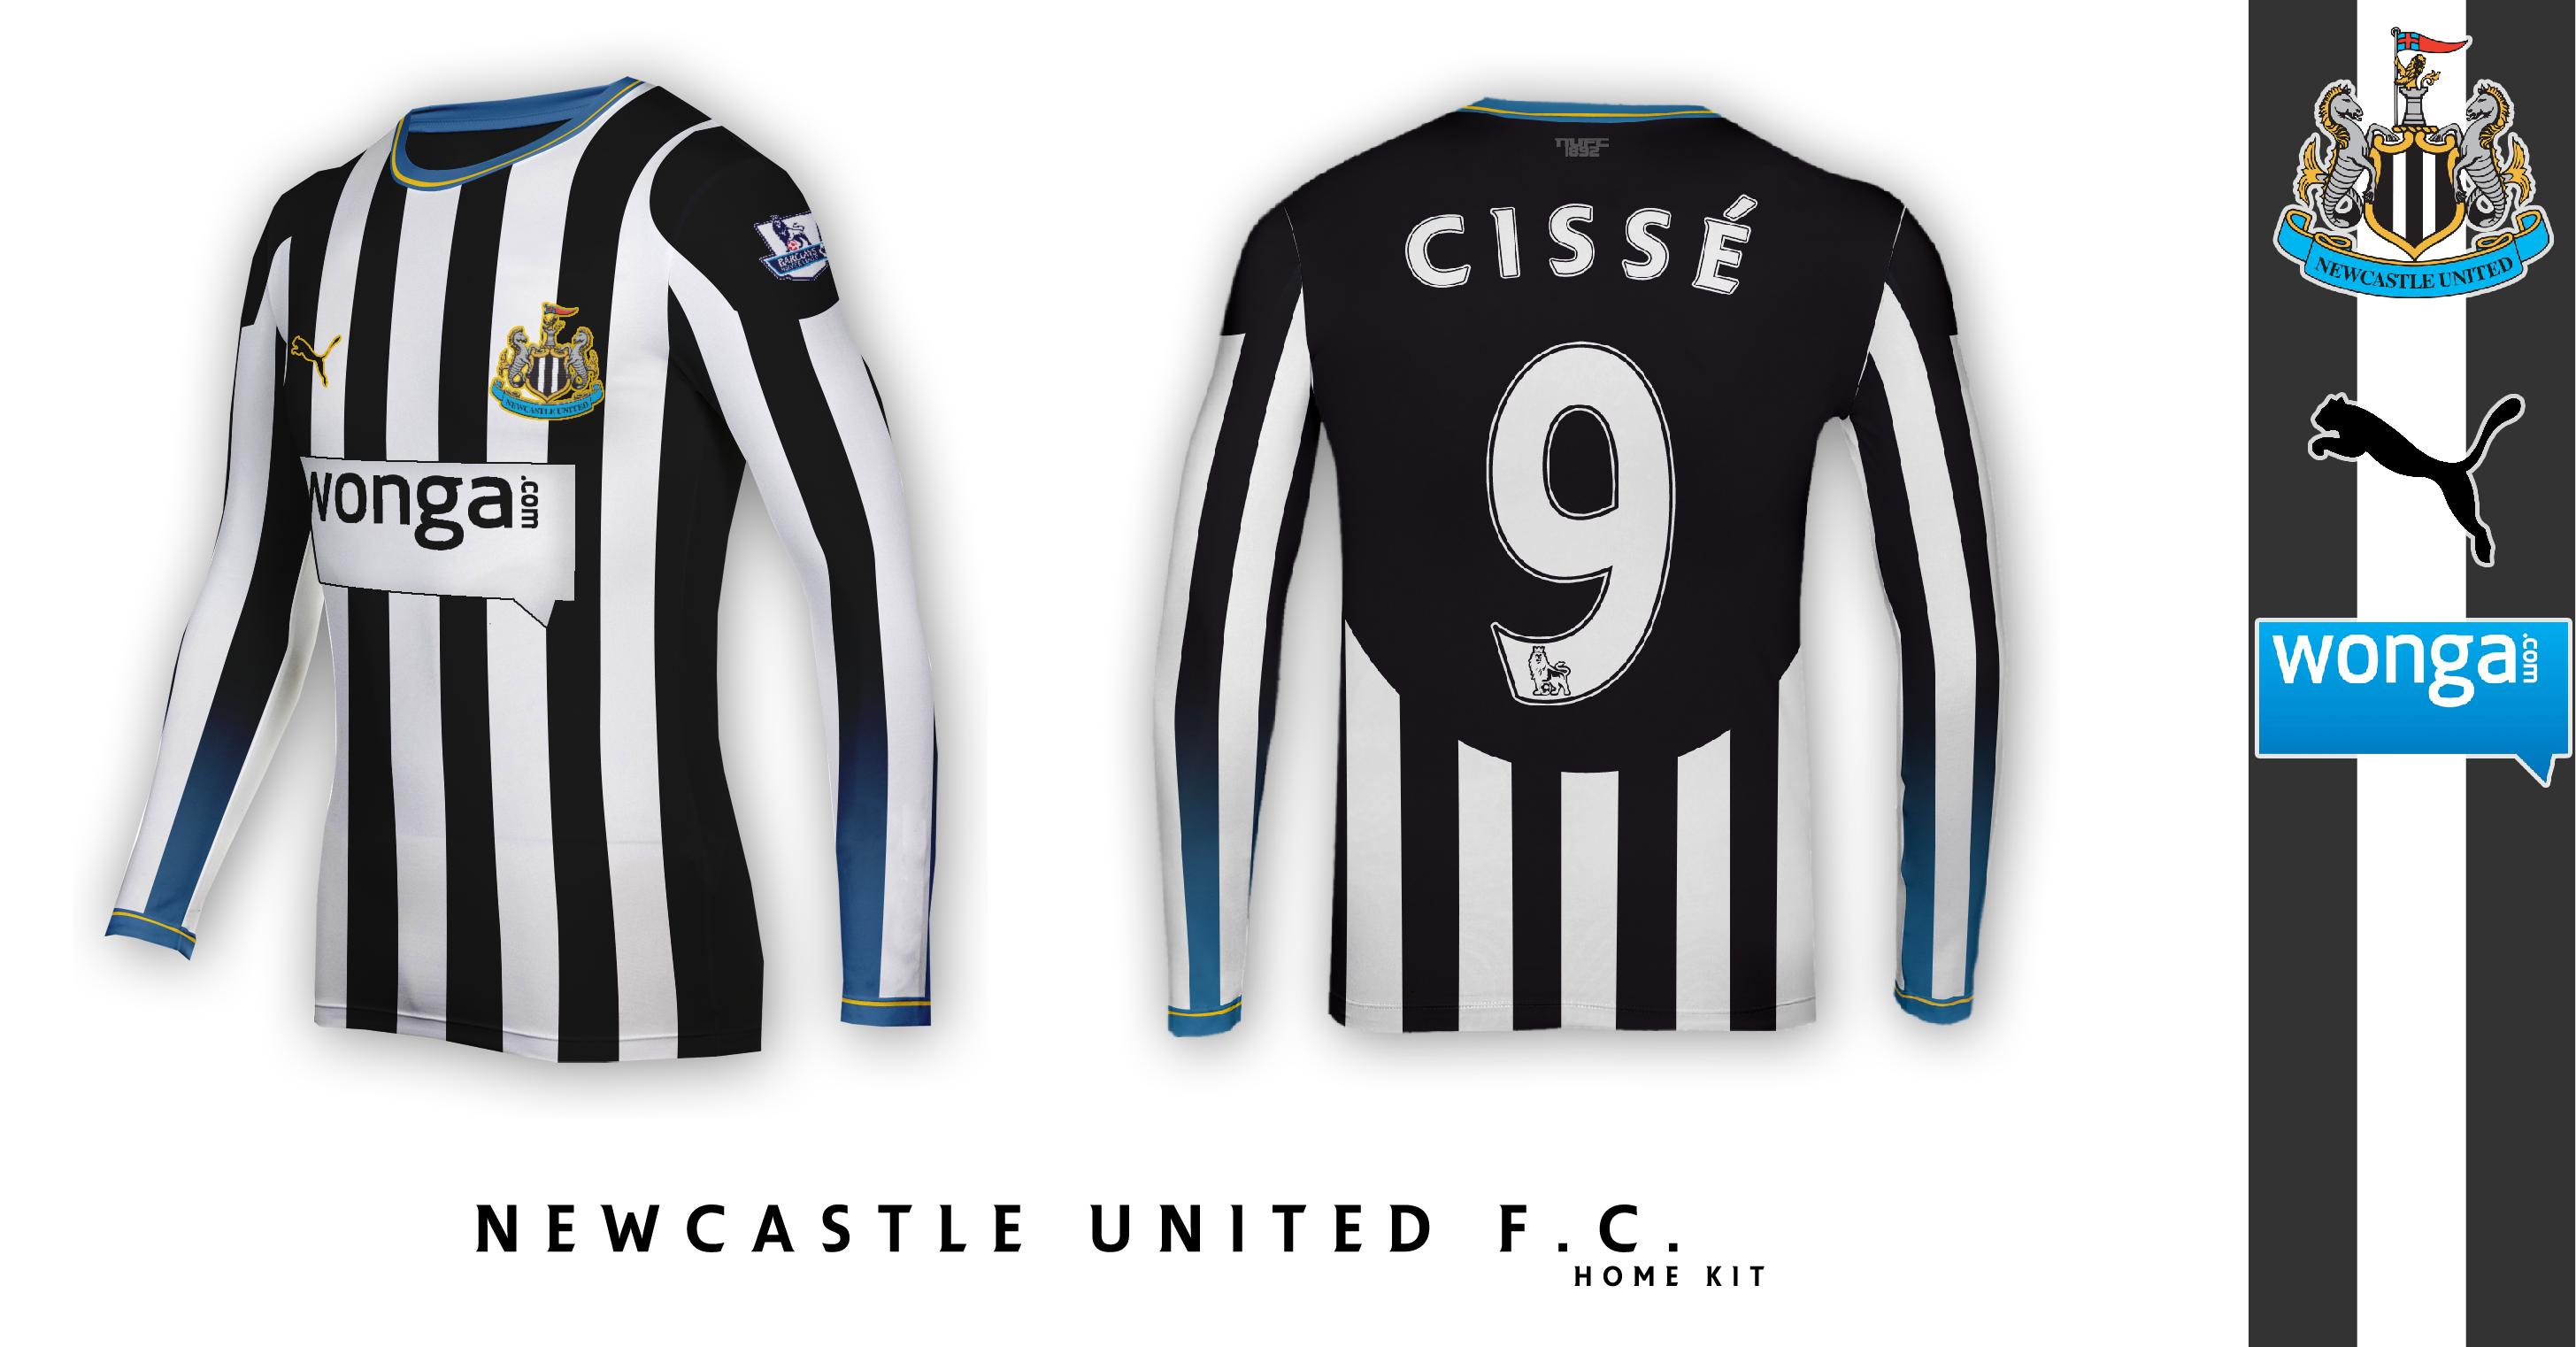 new product 11e1c 20067 Newcastle United